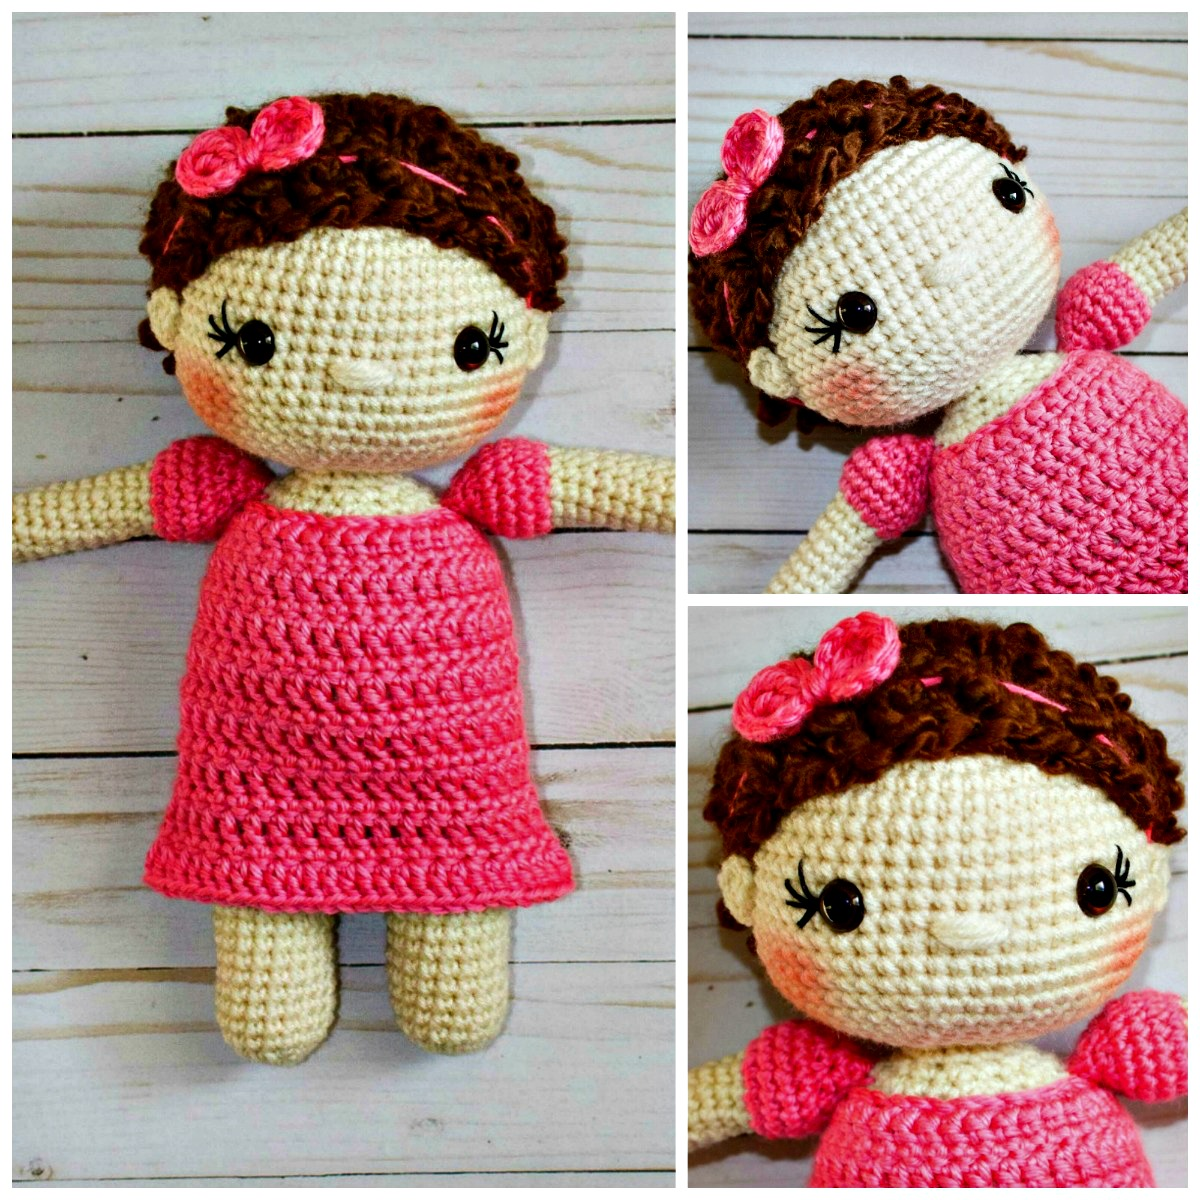 Free Crochet Doll Pattern- The Friendly Mae